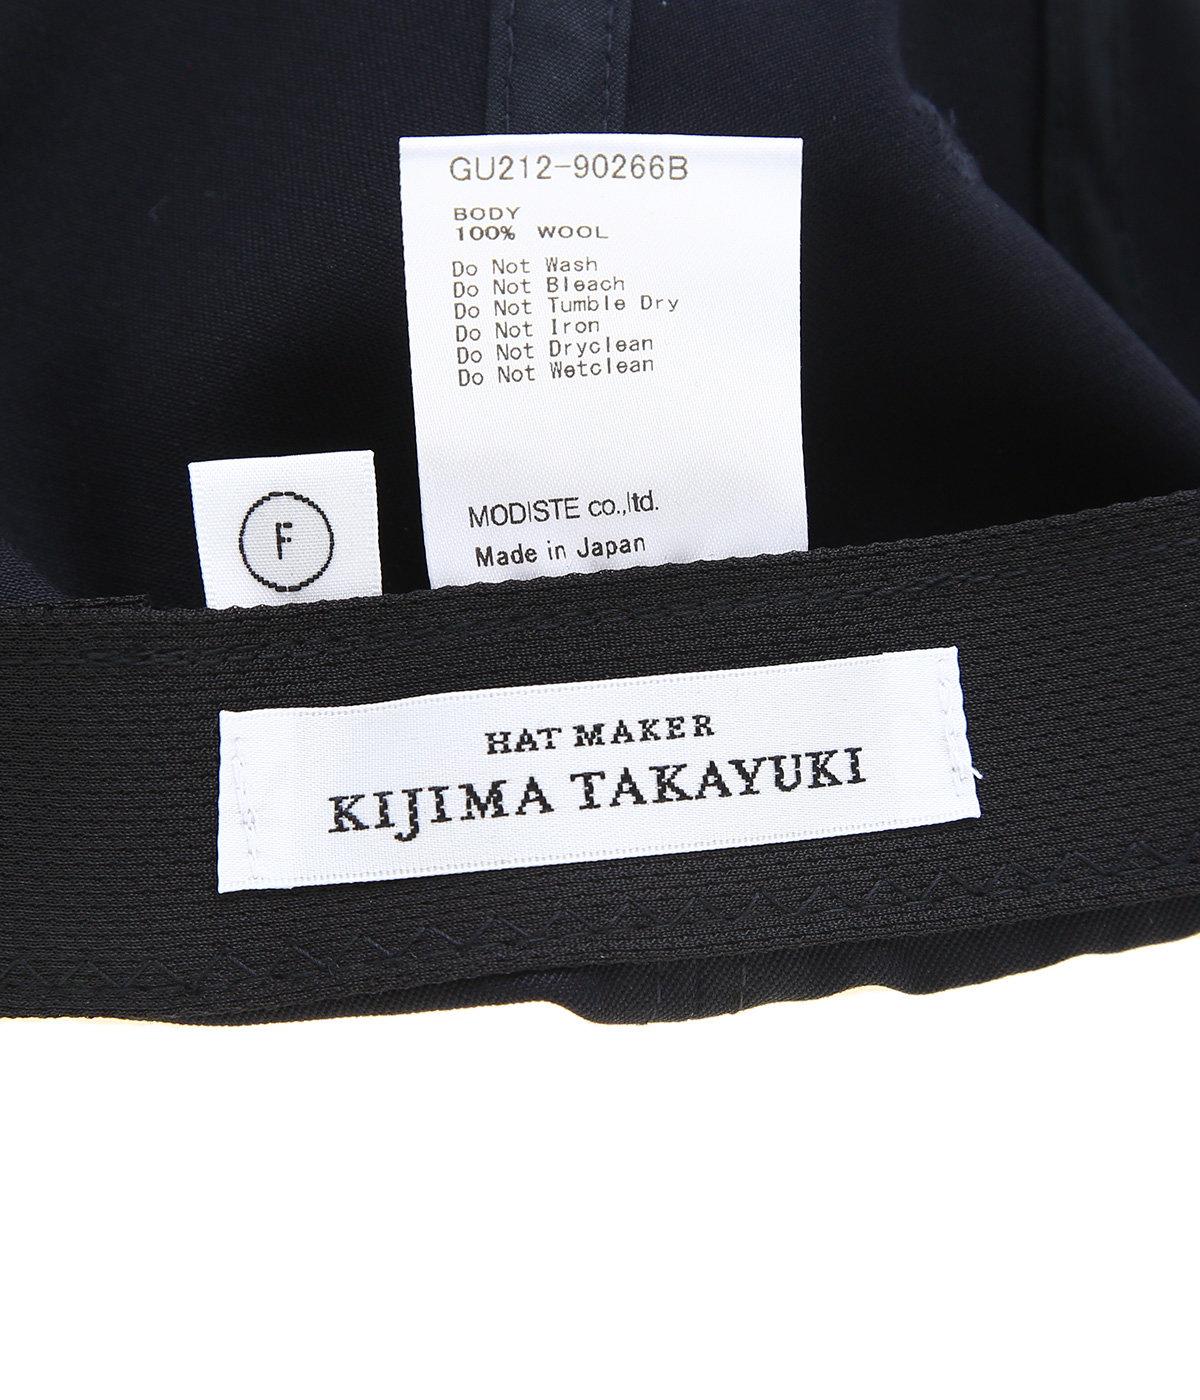 KIJIMA TAKAYUKI for Graphpaper Selvage Wool 6 Panel Cap